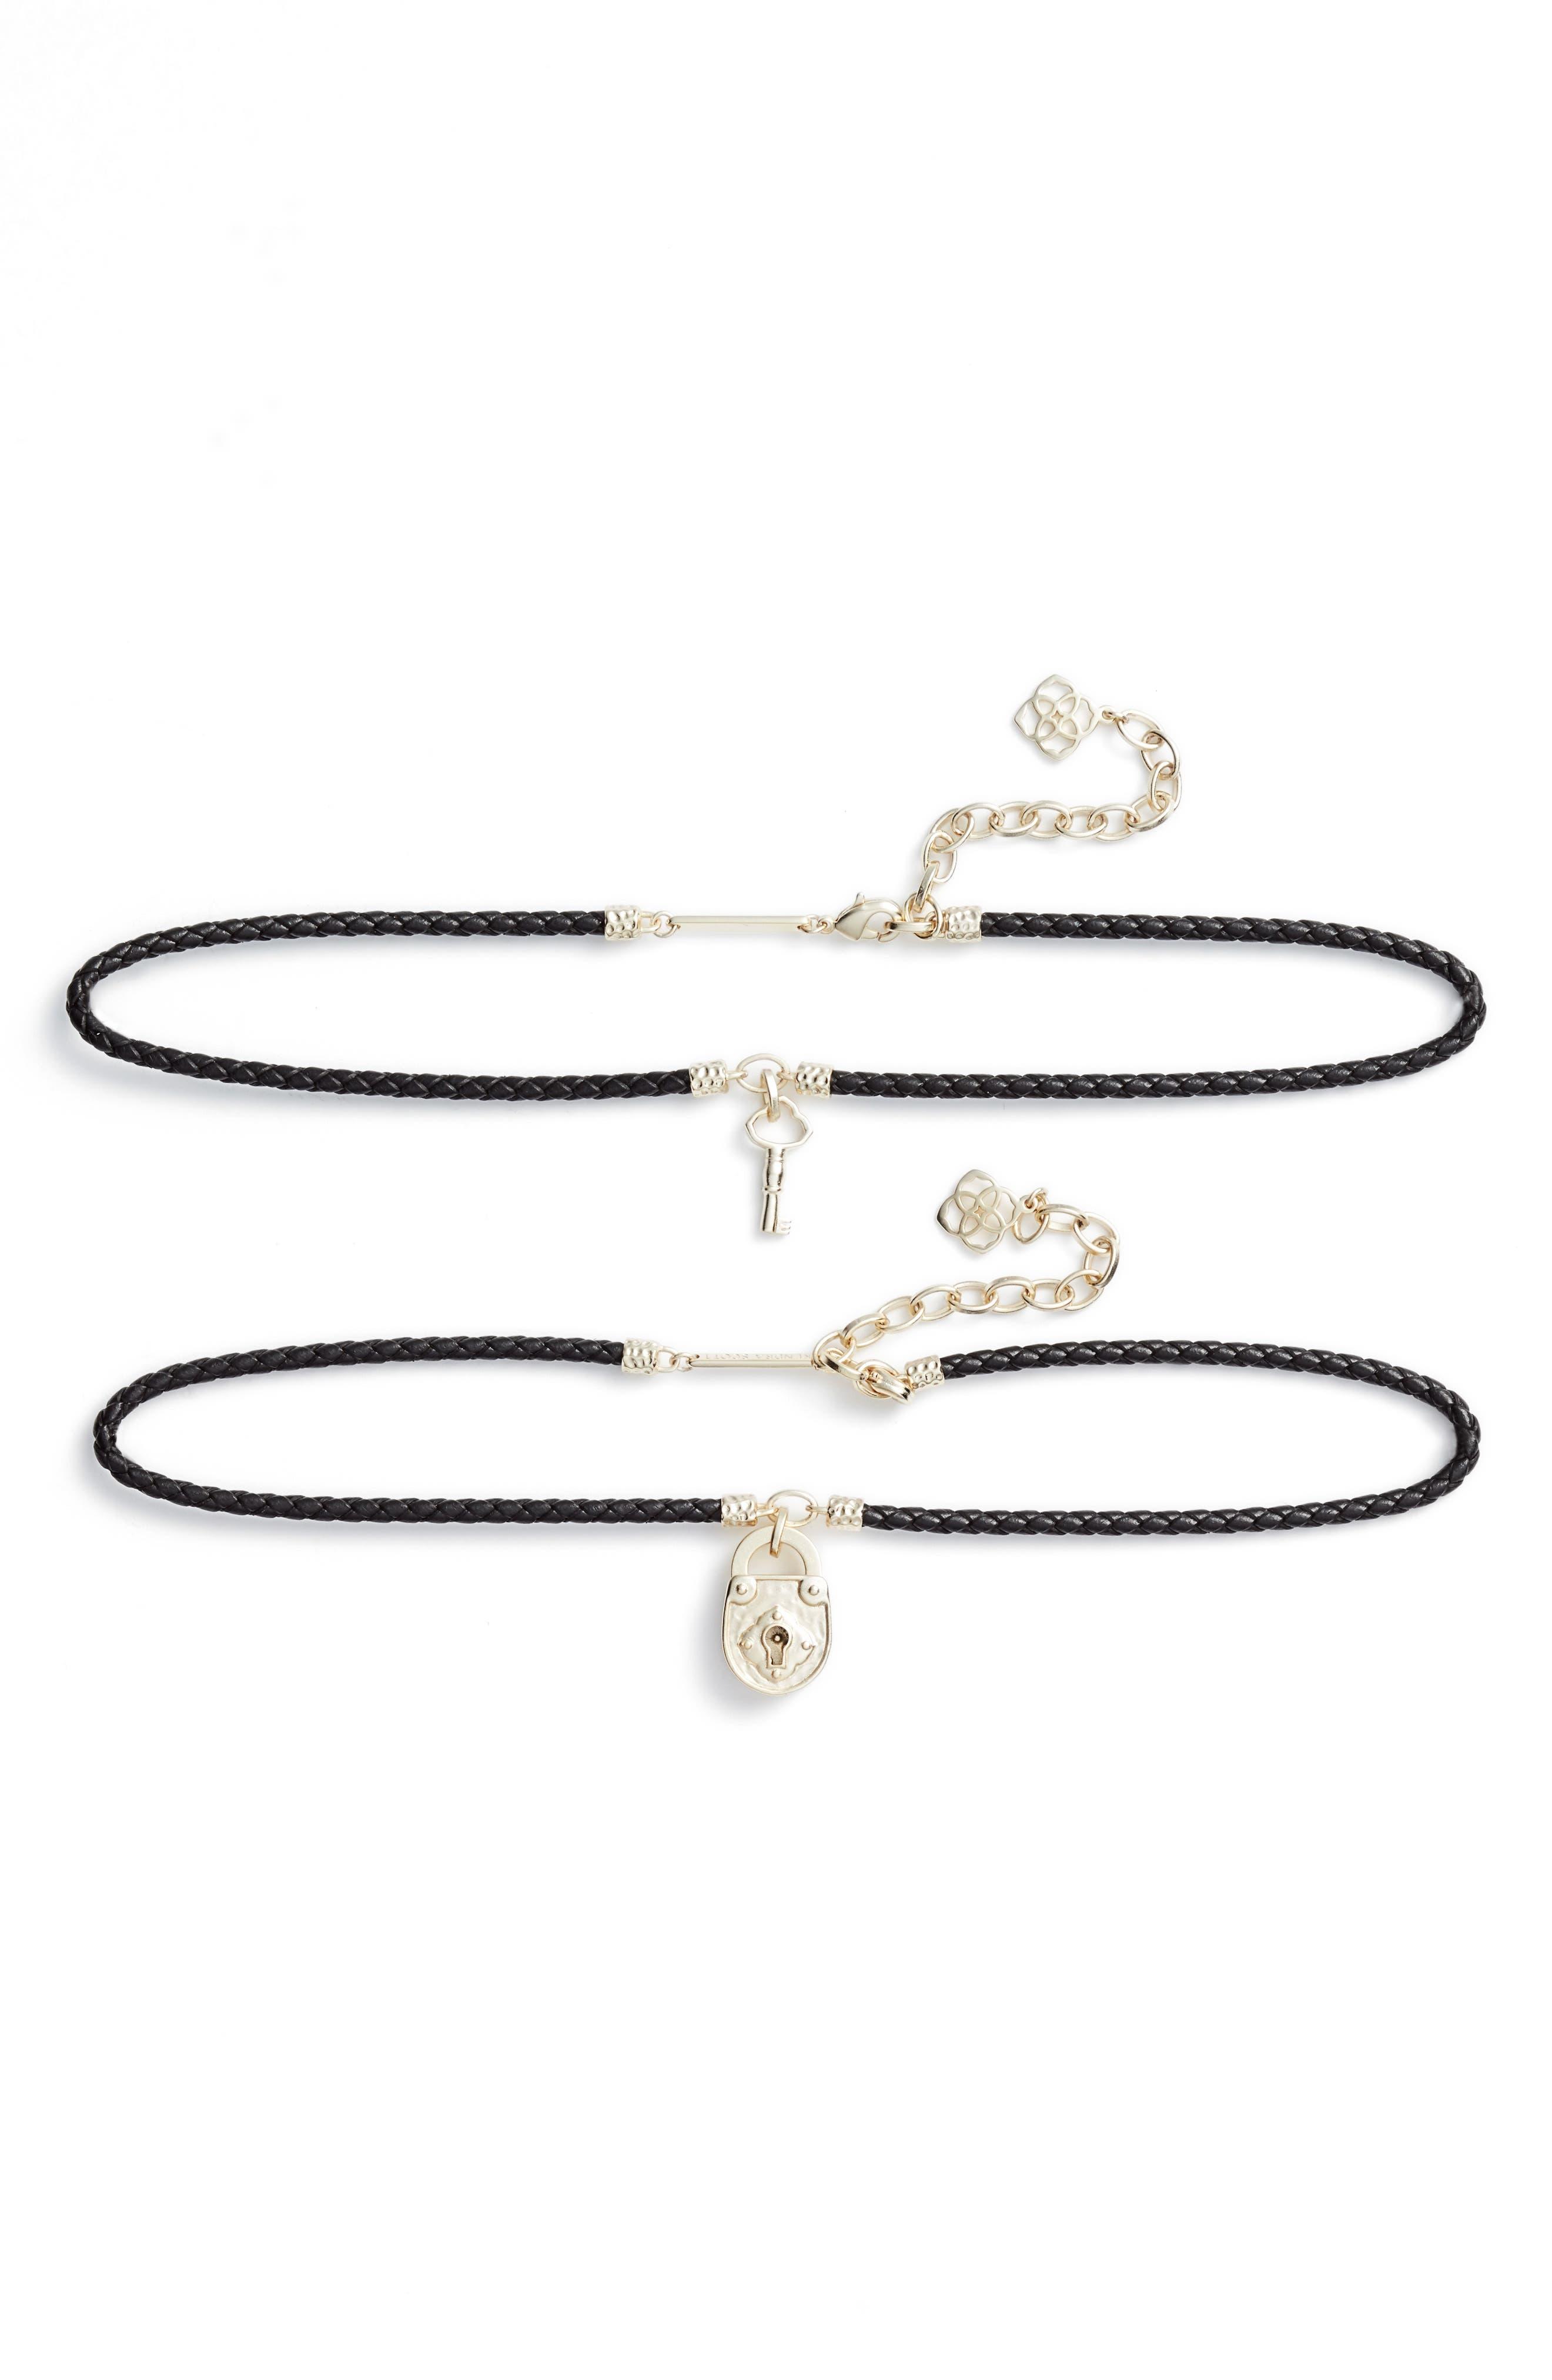 Main Image - Kendra Scott Sunny Set of 2 Choker Necklaces